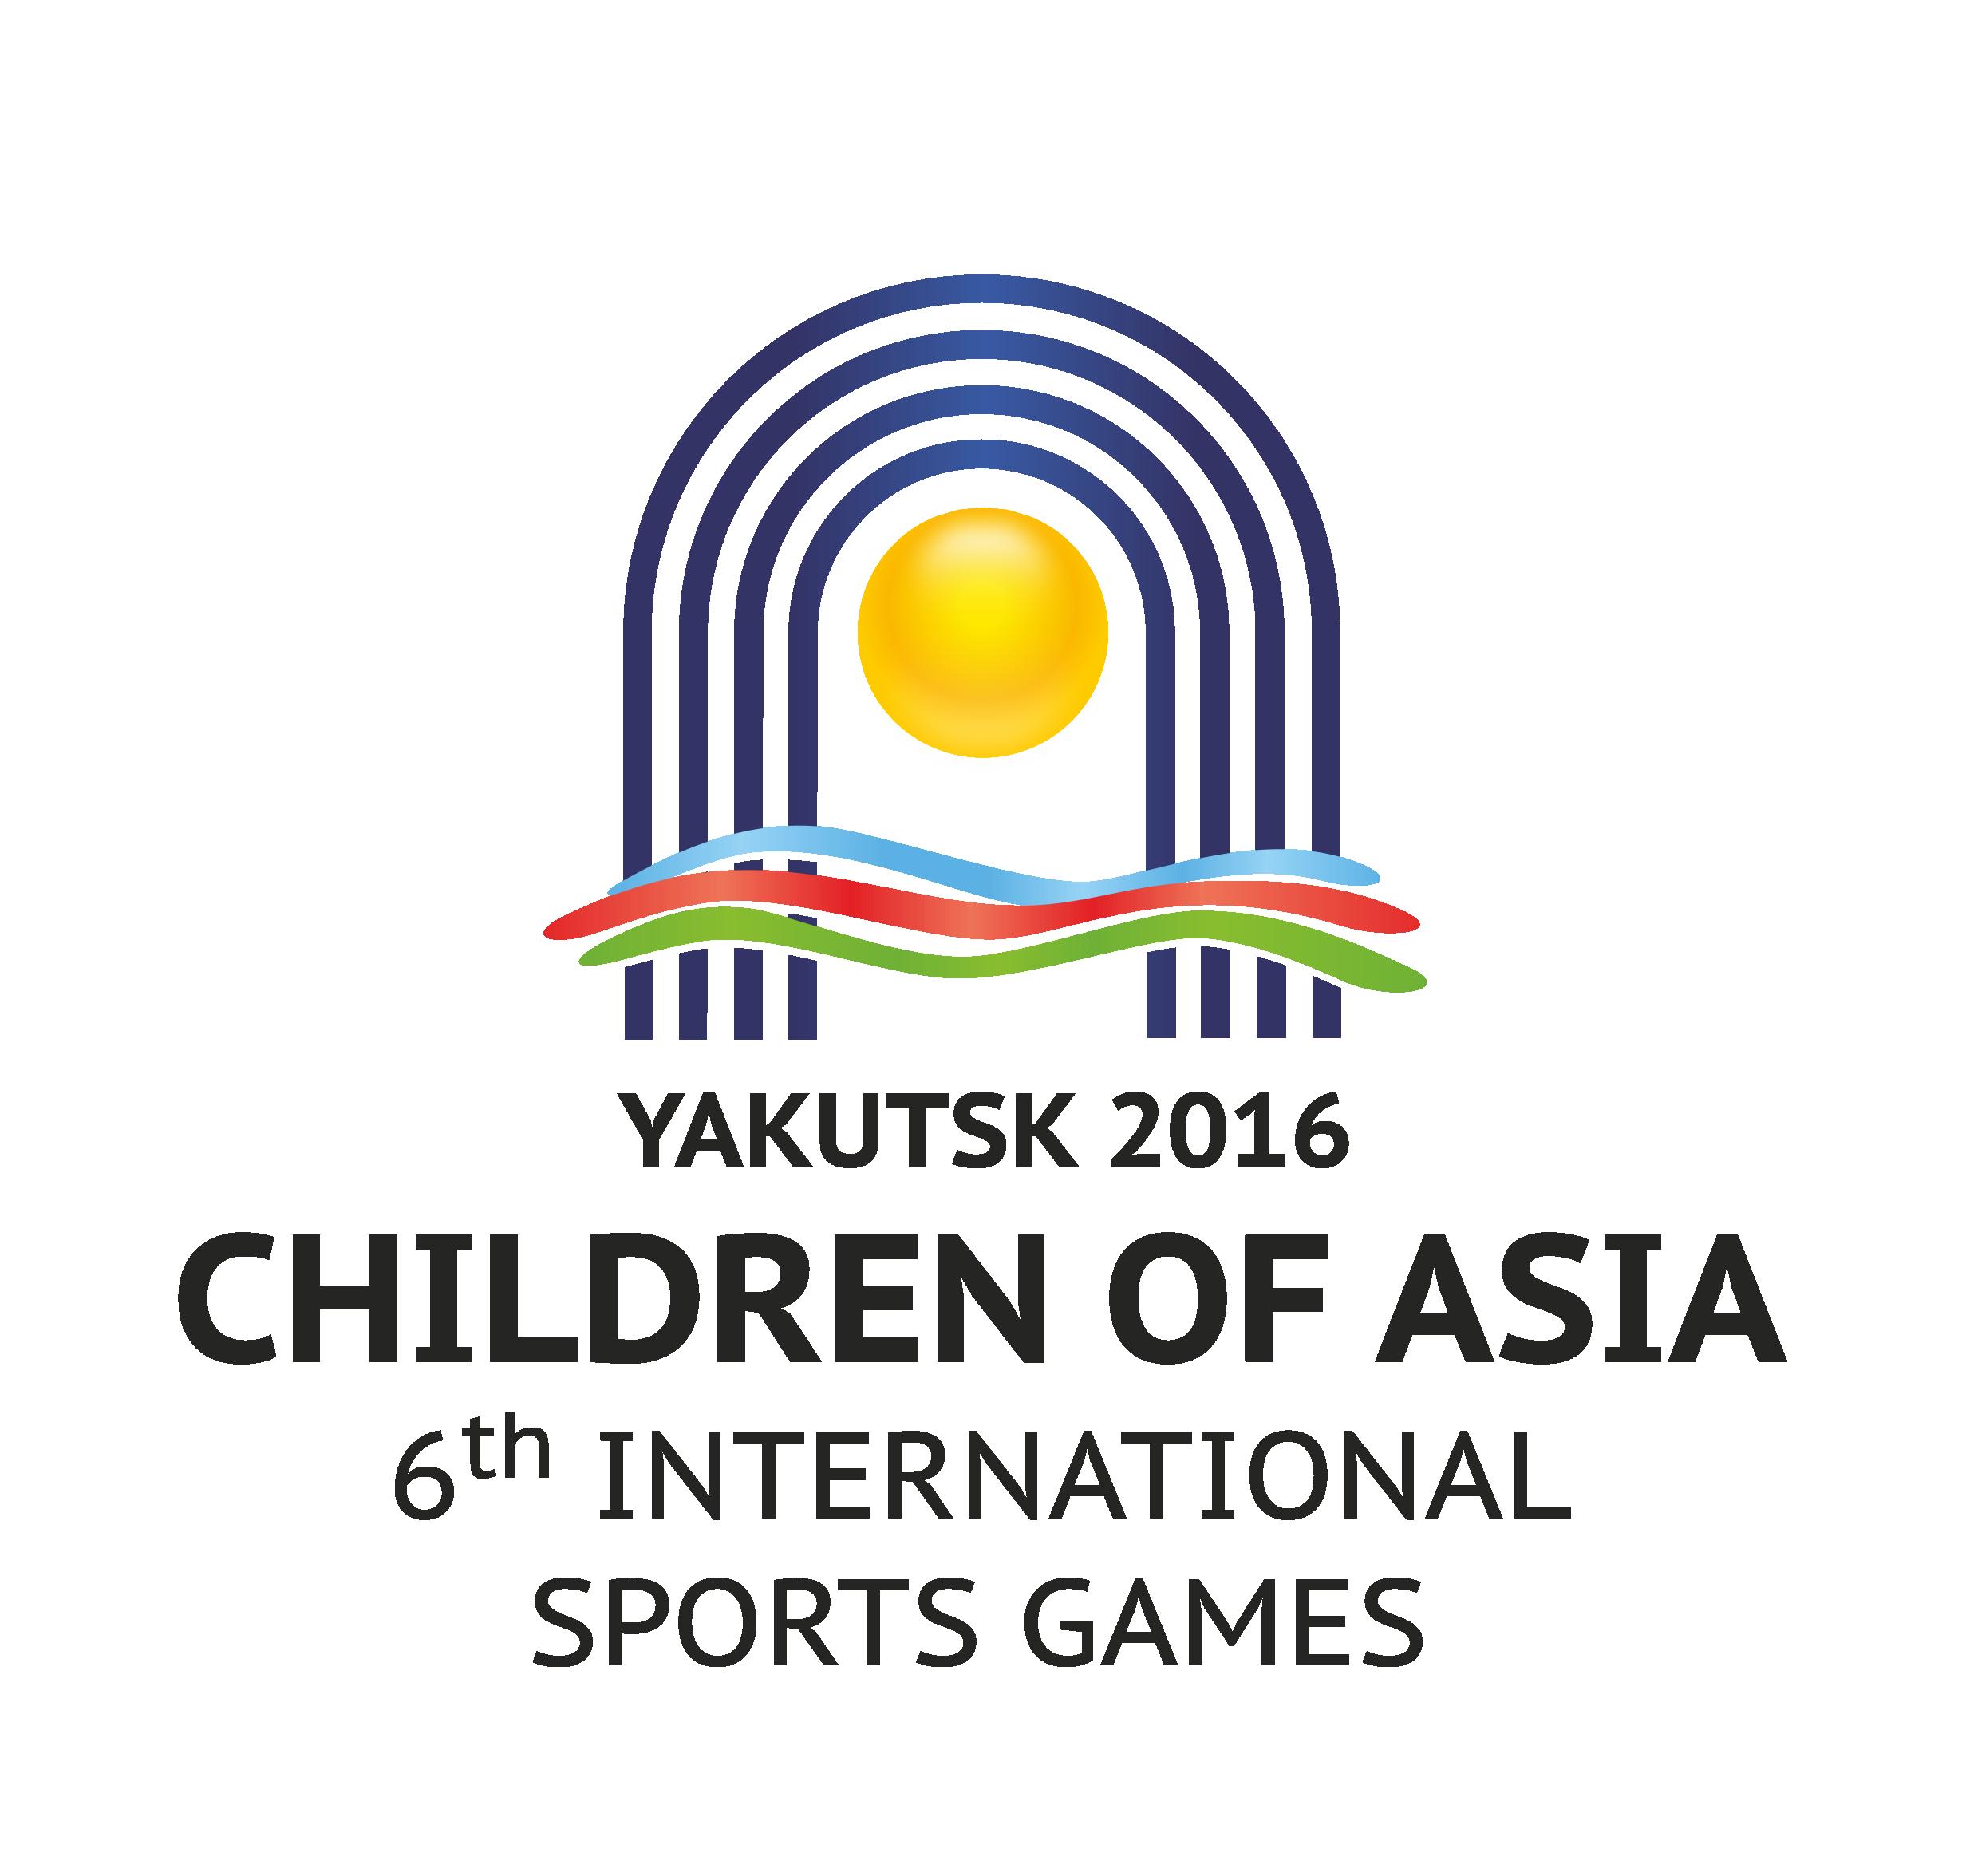 фото дети азии